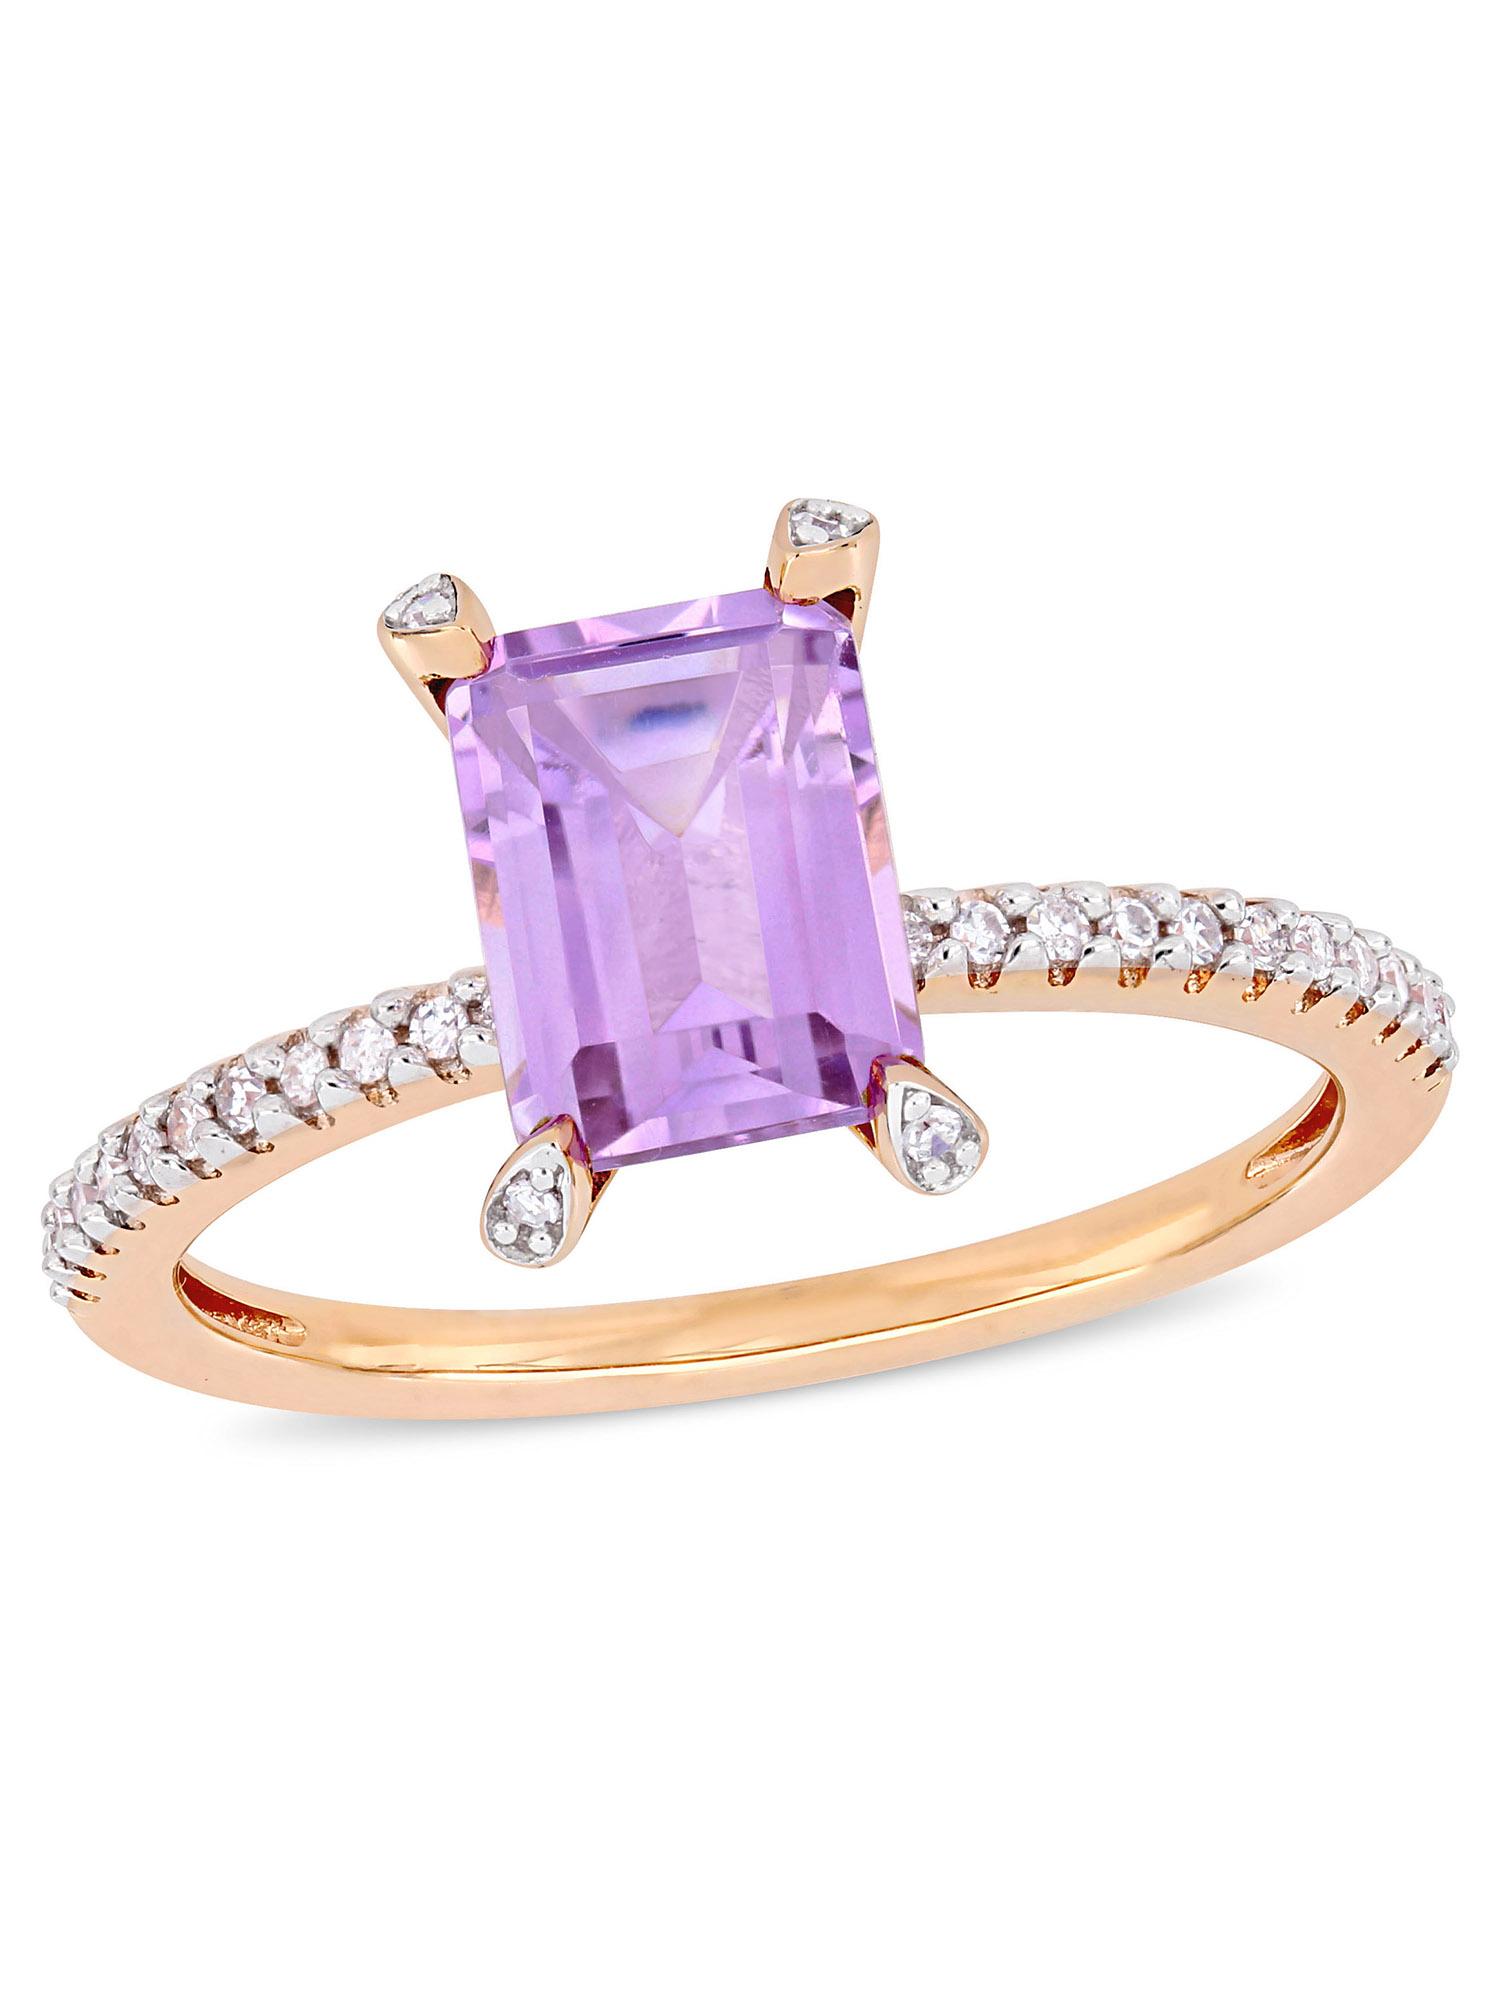 Tangelo 1-5/8 Carat T.G.W. Rose de France and 1/10 Carat T.W. Diamond 10kt Rose Gold Engagement Ring